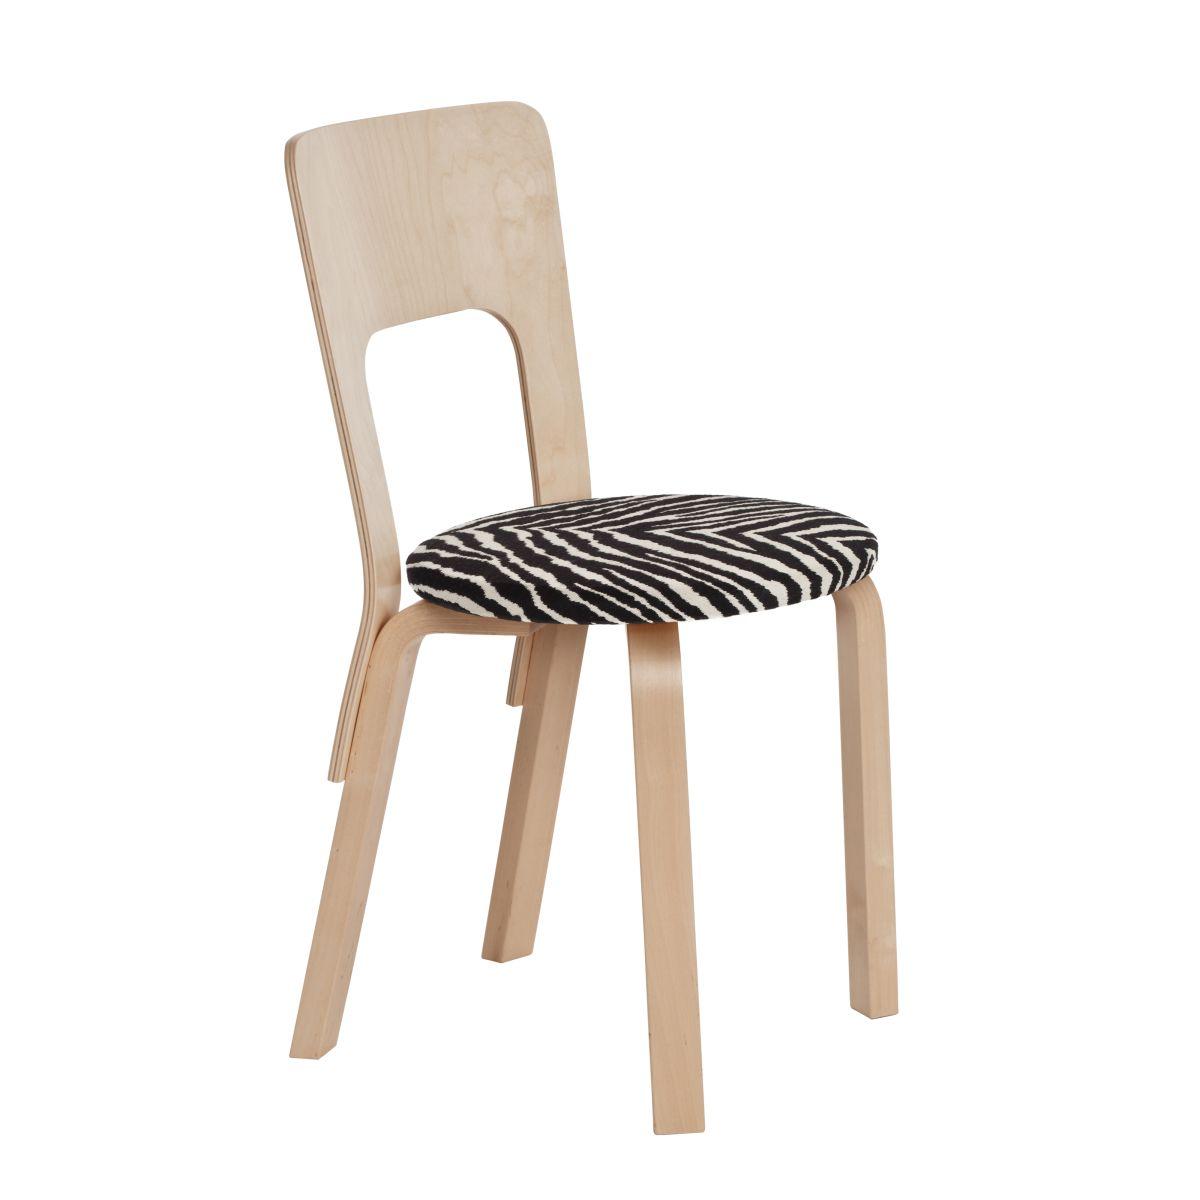 Chair 66 Legs Birch Top Fabric Upholstery Zebra 2463563